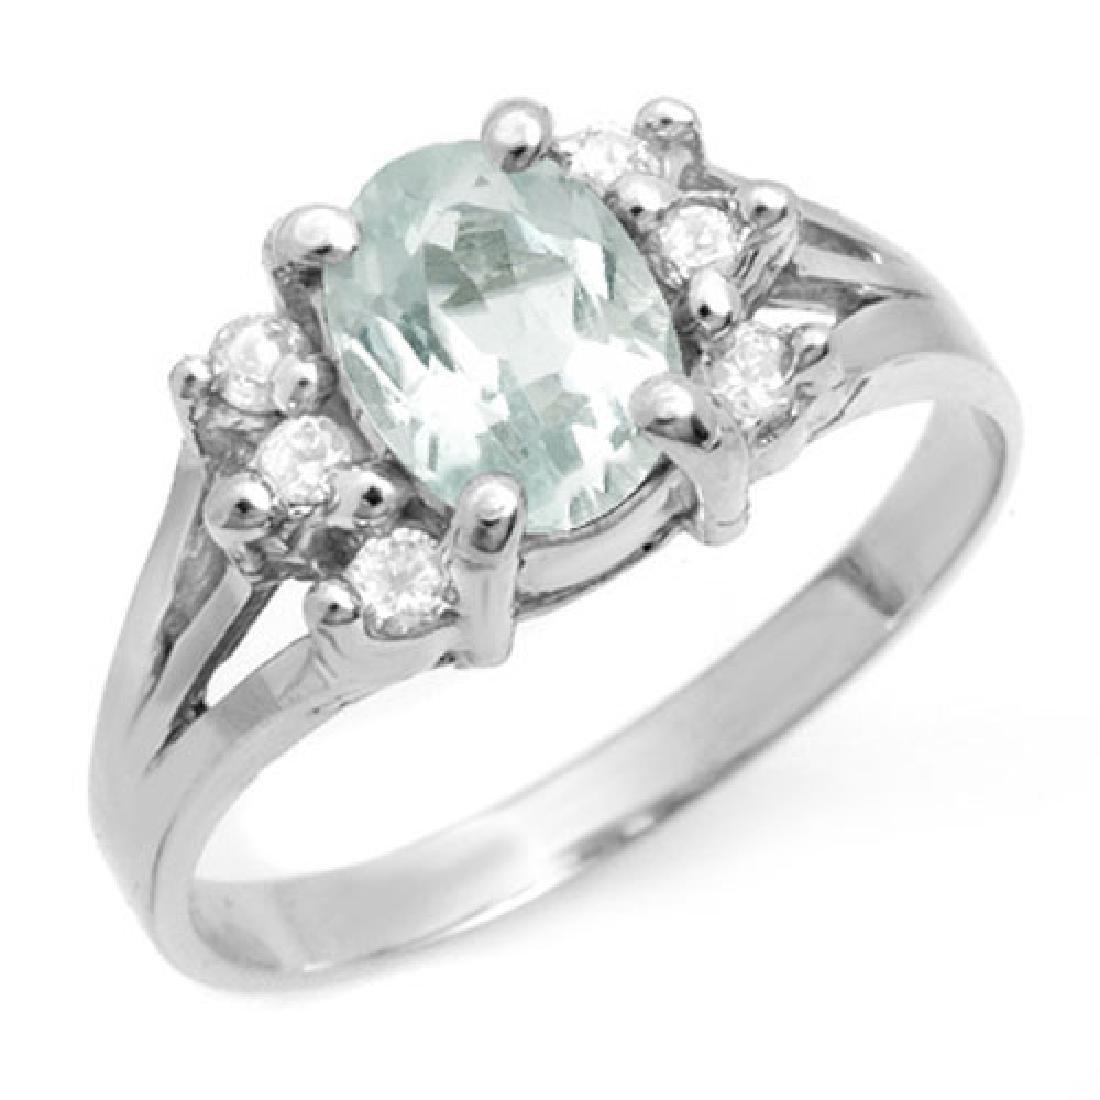 1.43 CTW Aquamarine & Diamond Ring 18K White Gold